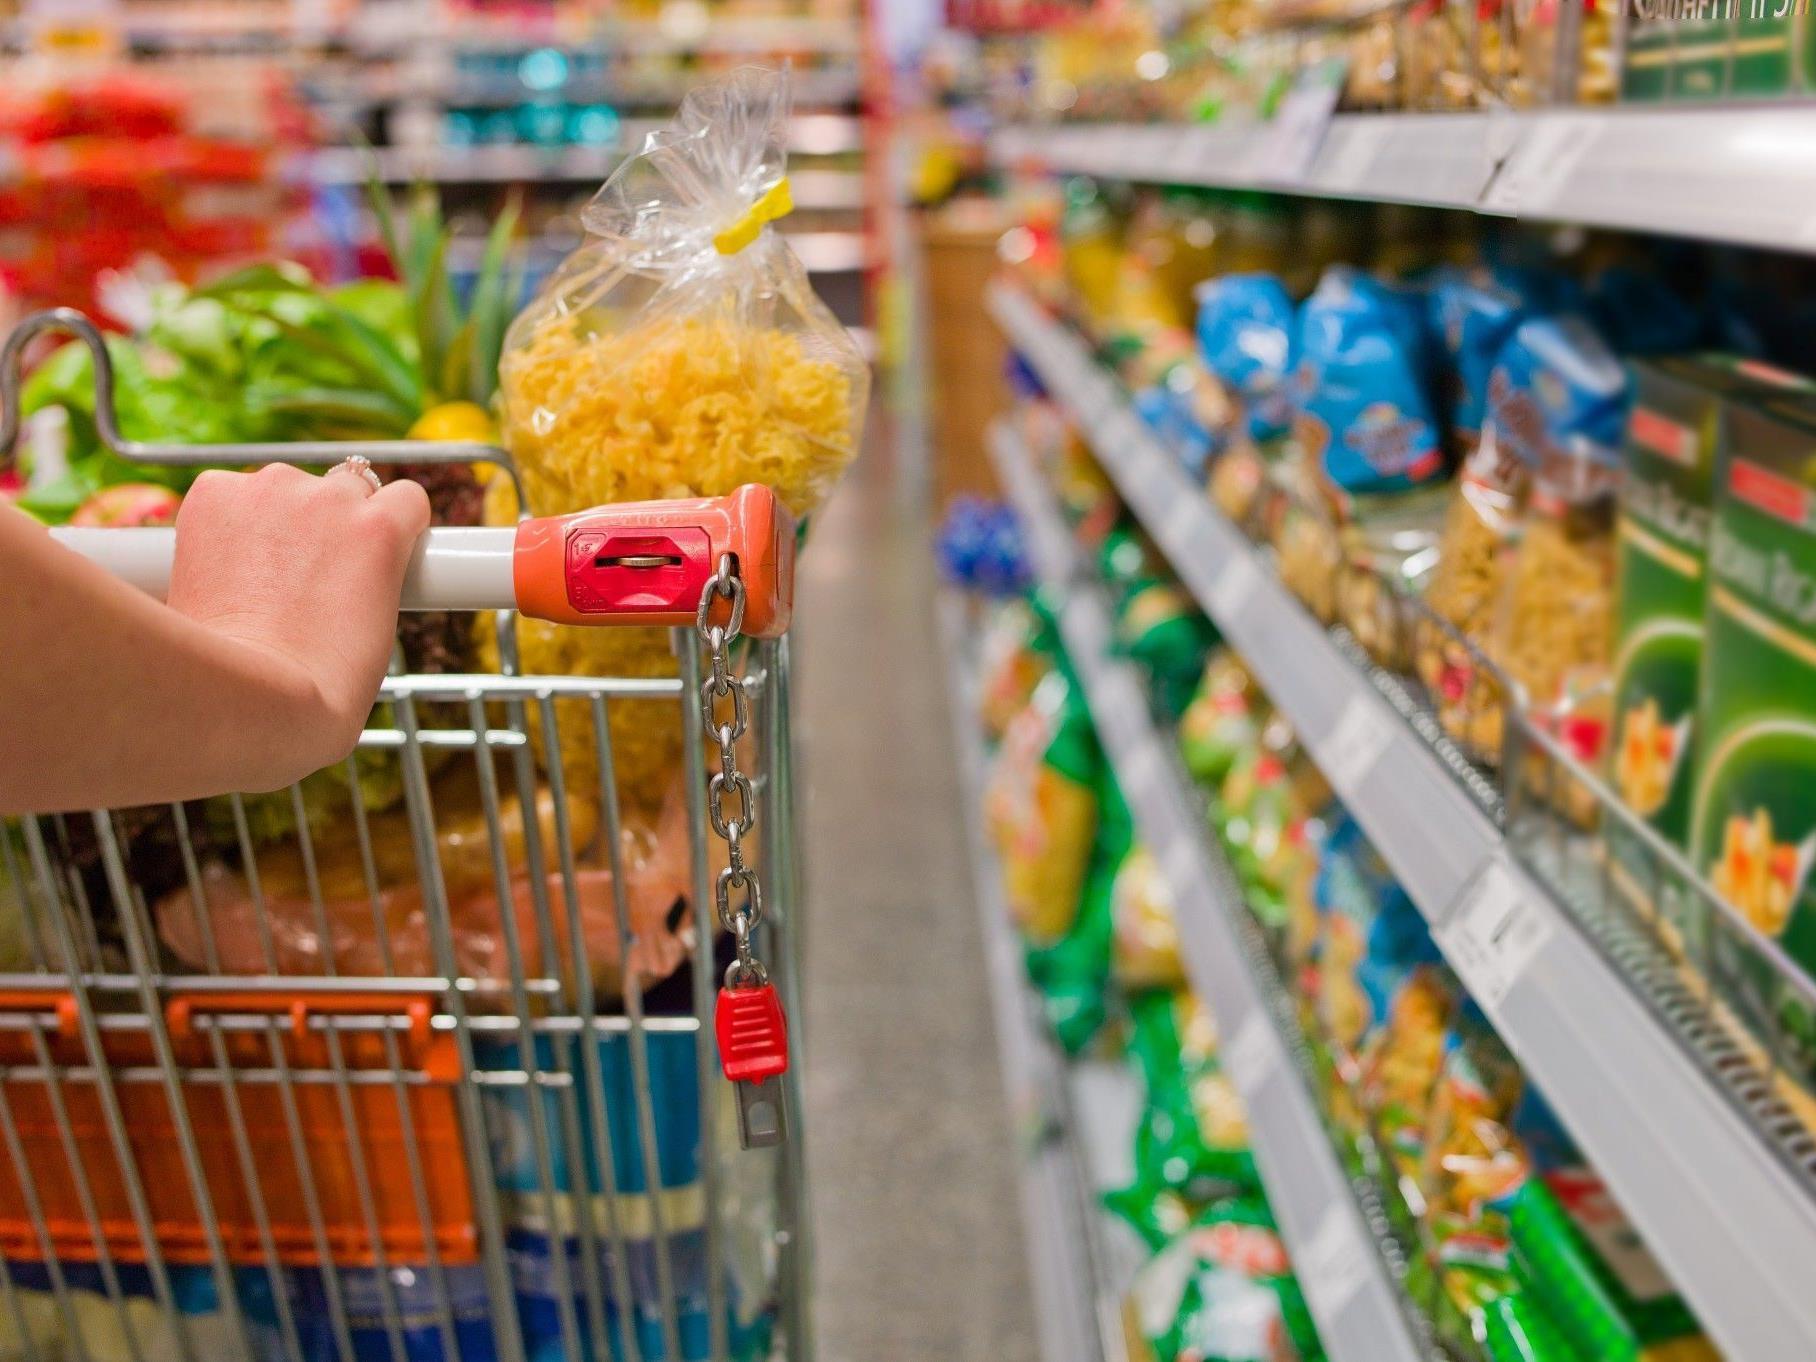 Vor allem Lebensmittel wurden teurer.